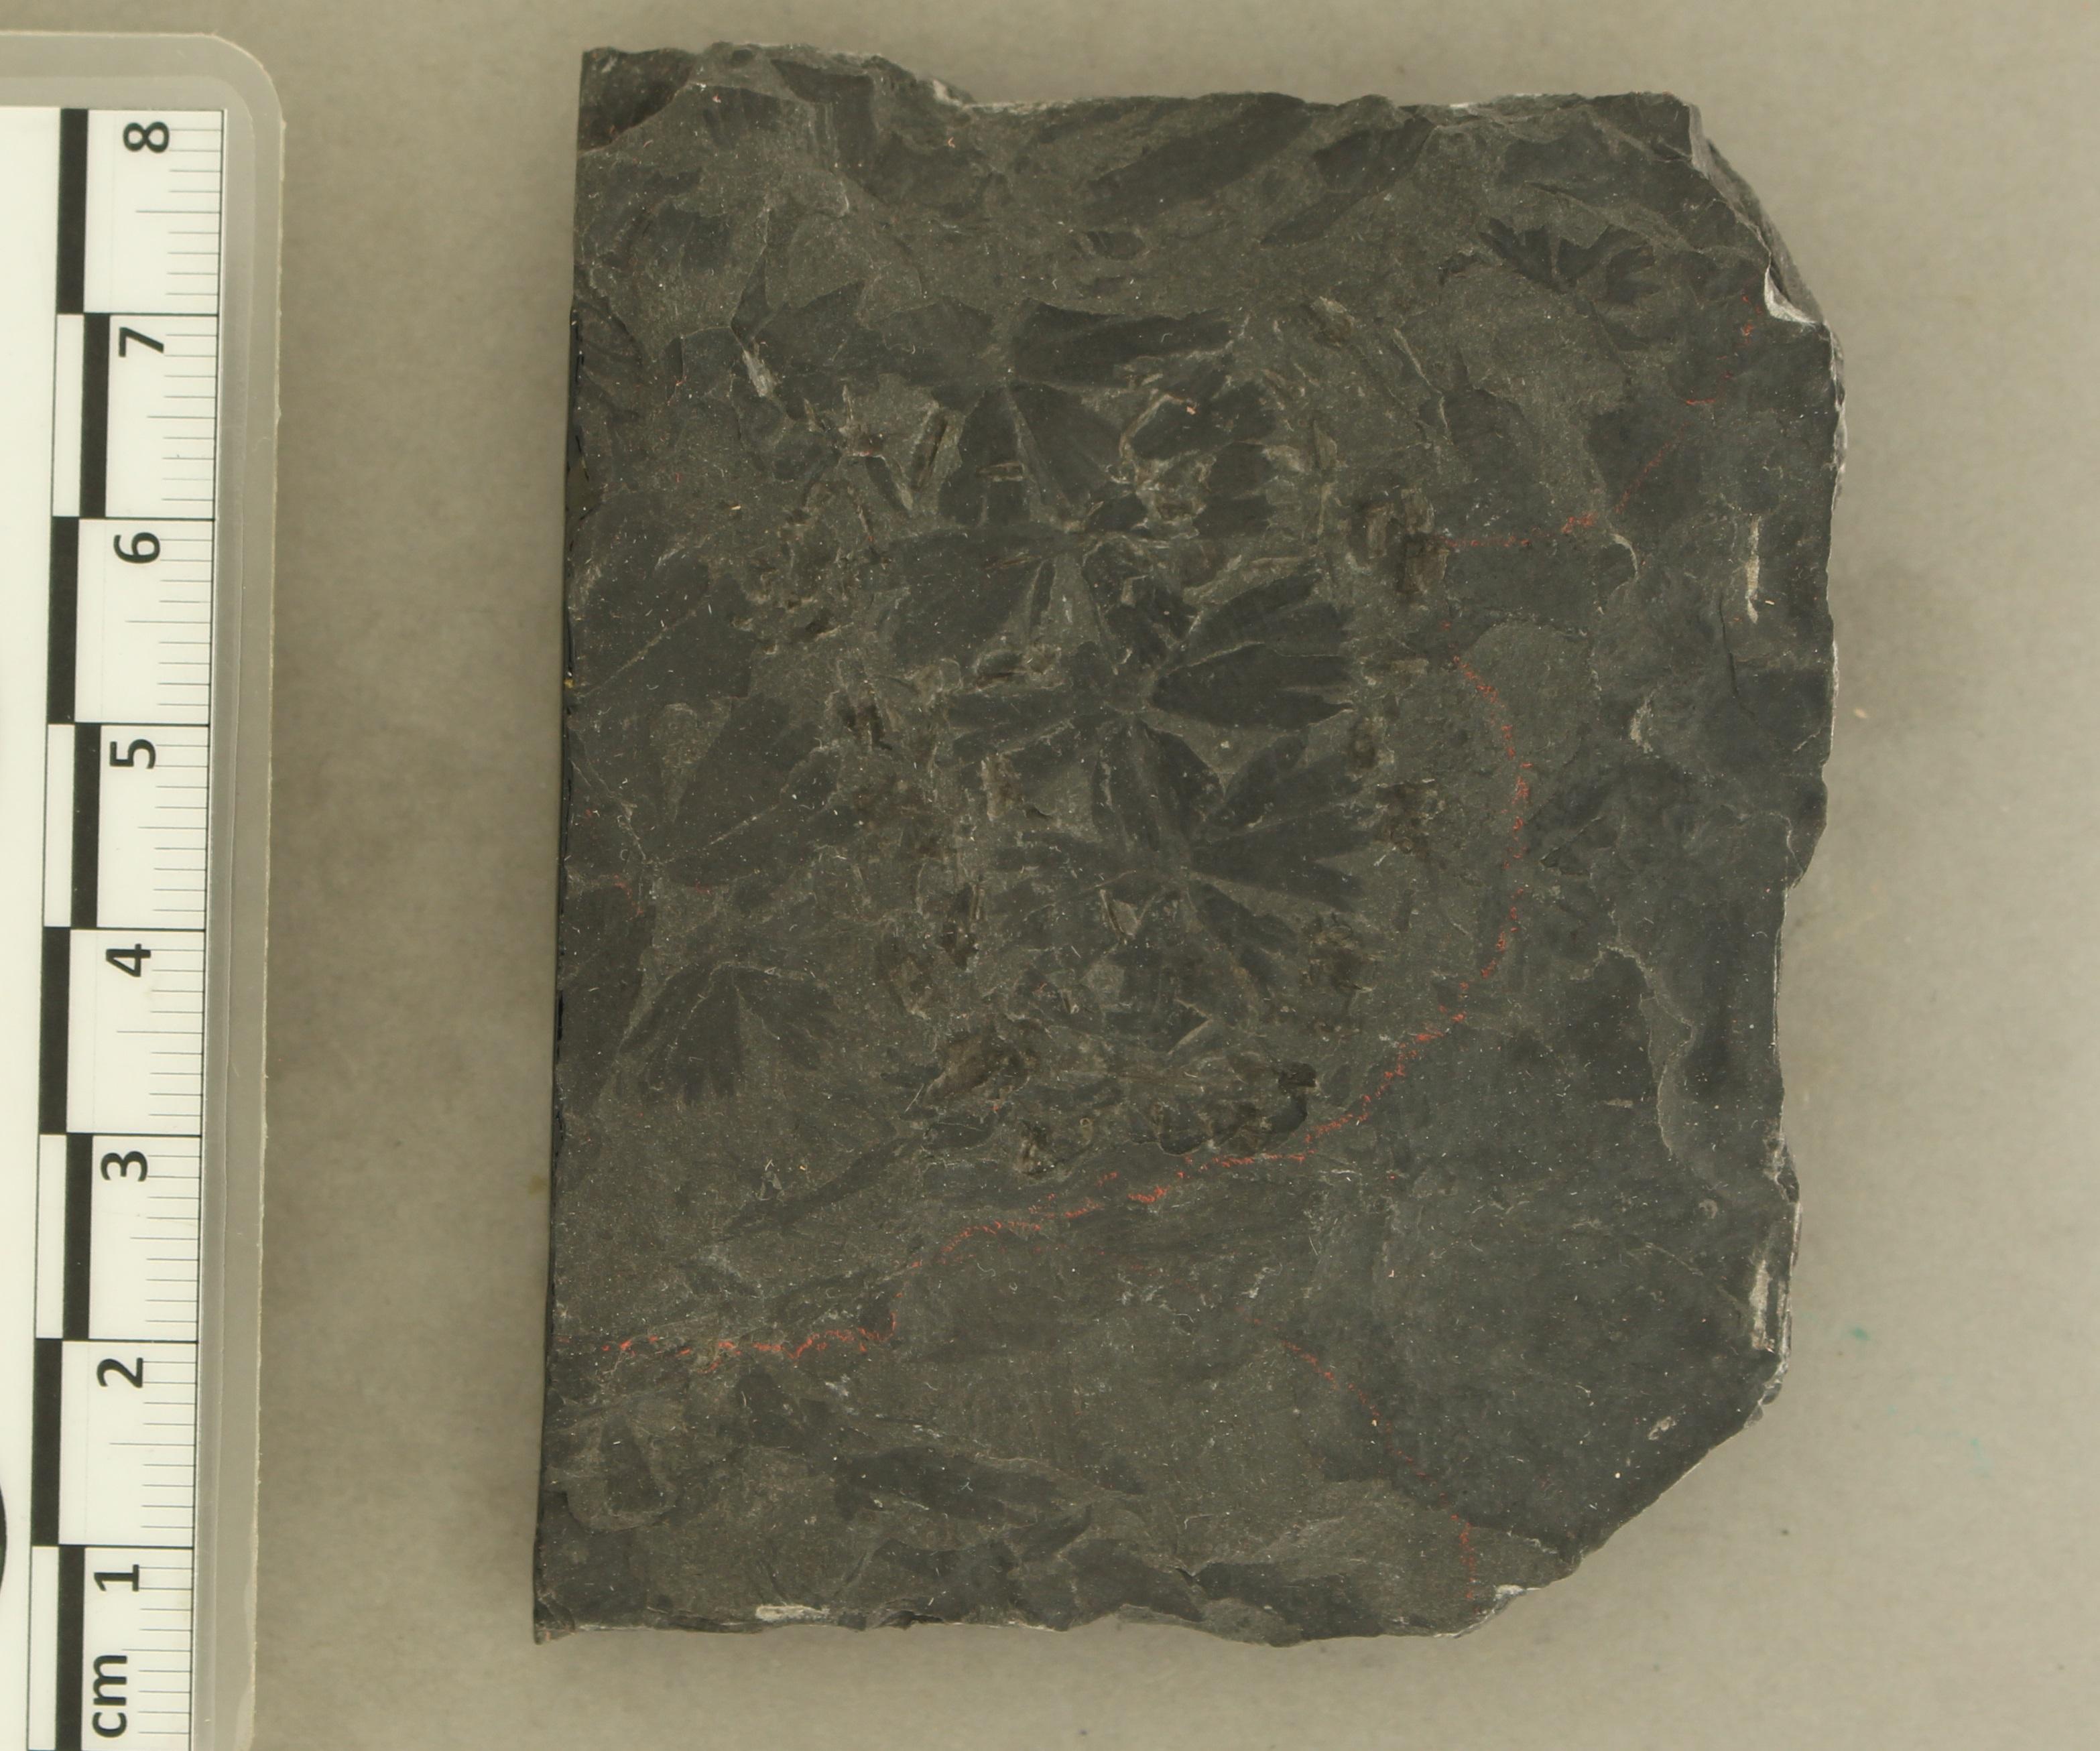 IRSNB b 8577 - Detail